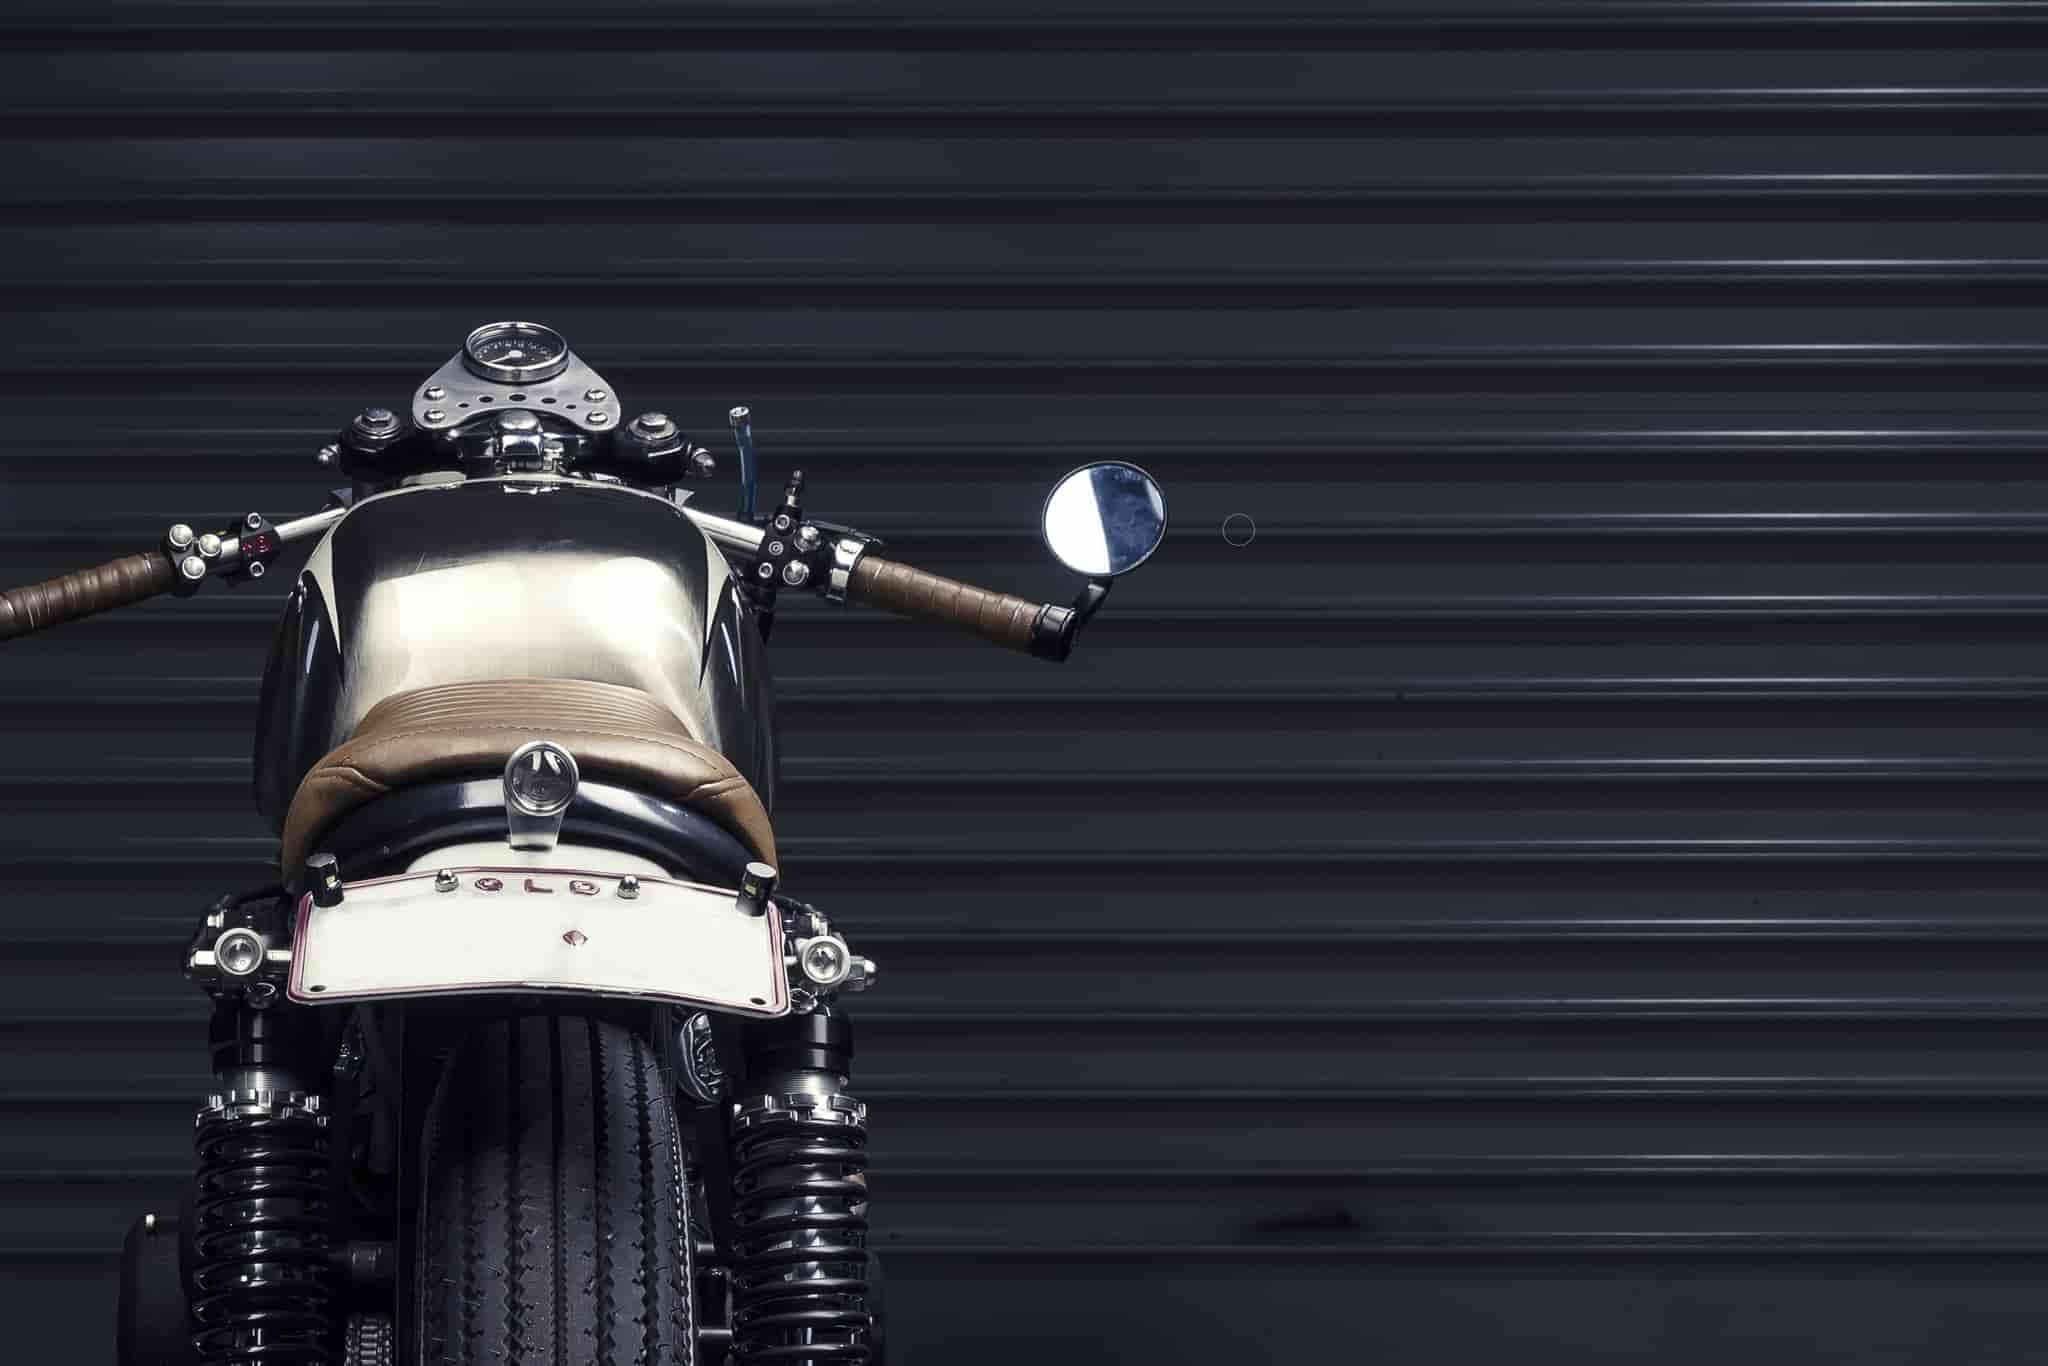 bike handlebars view from behind